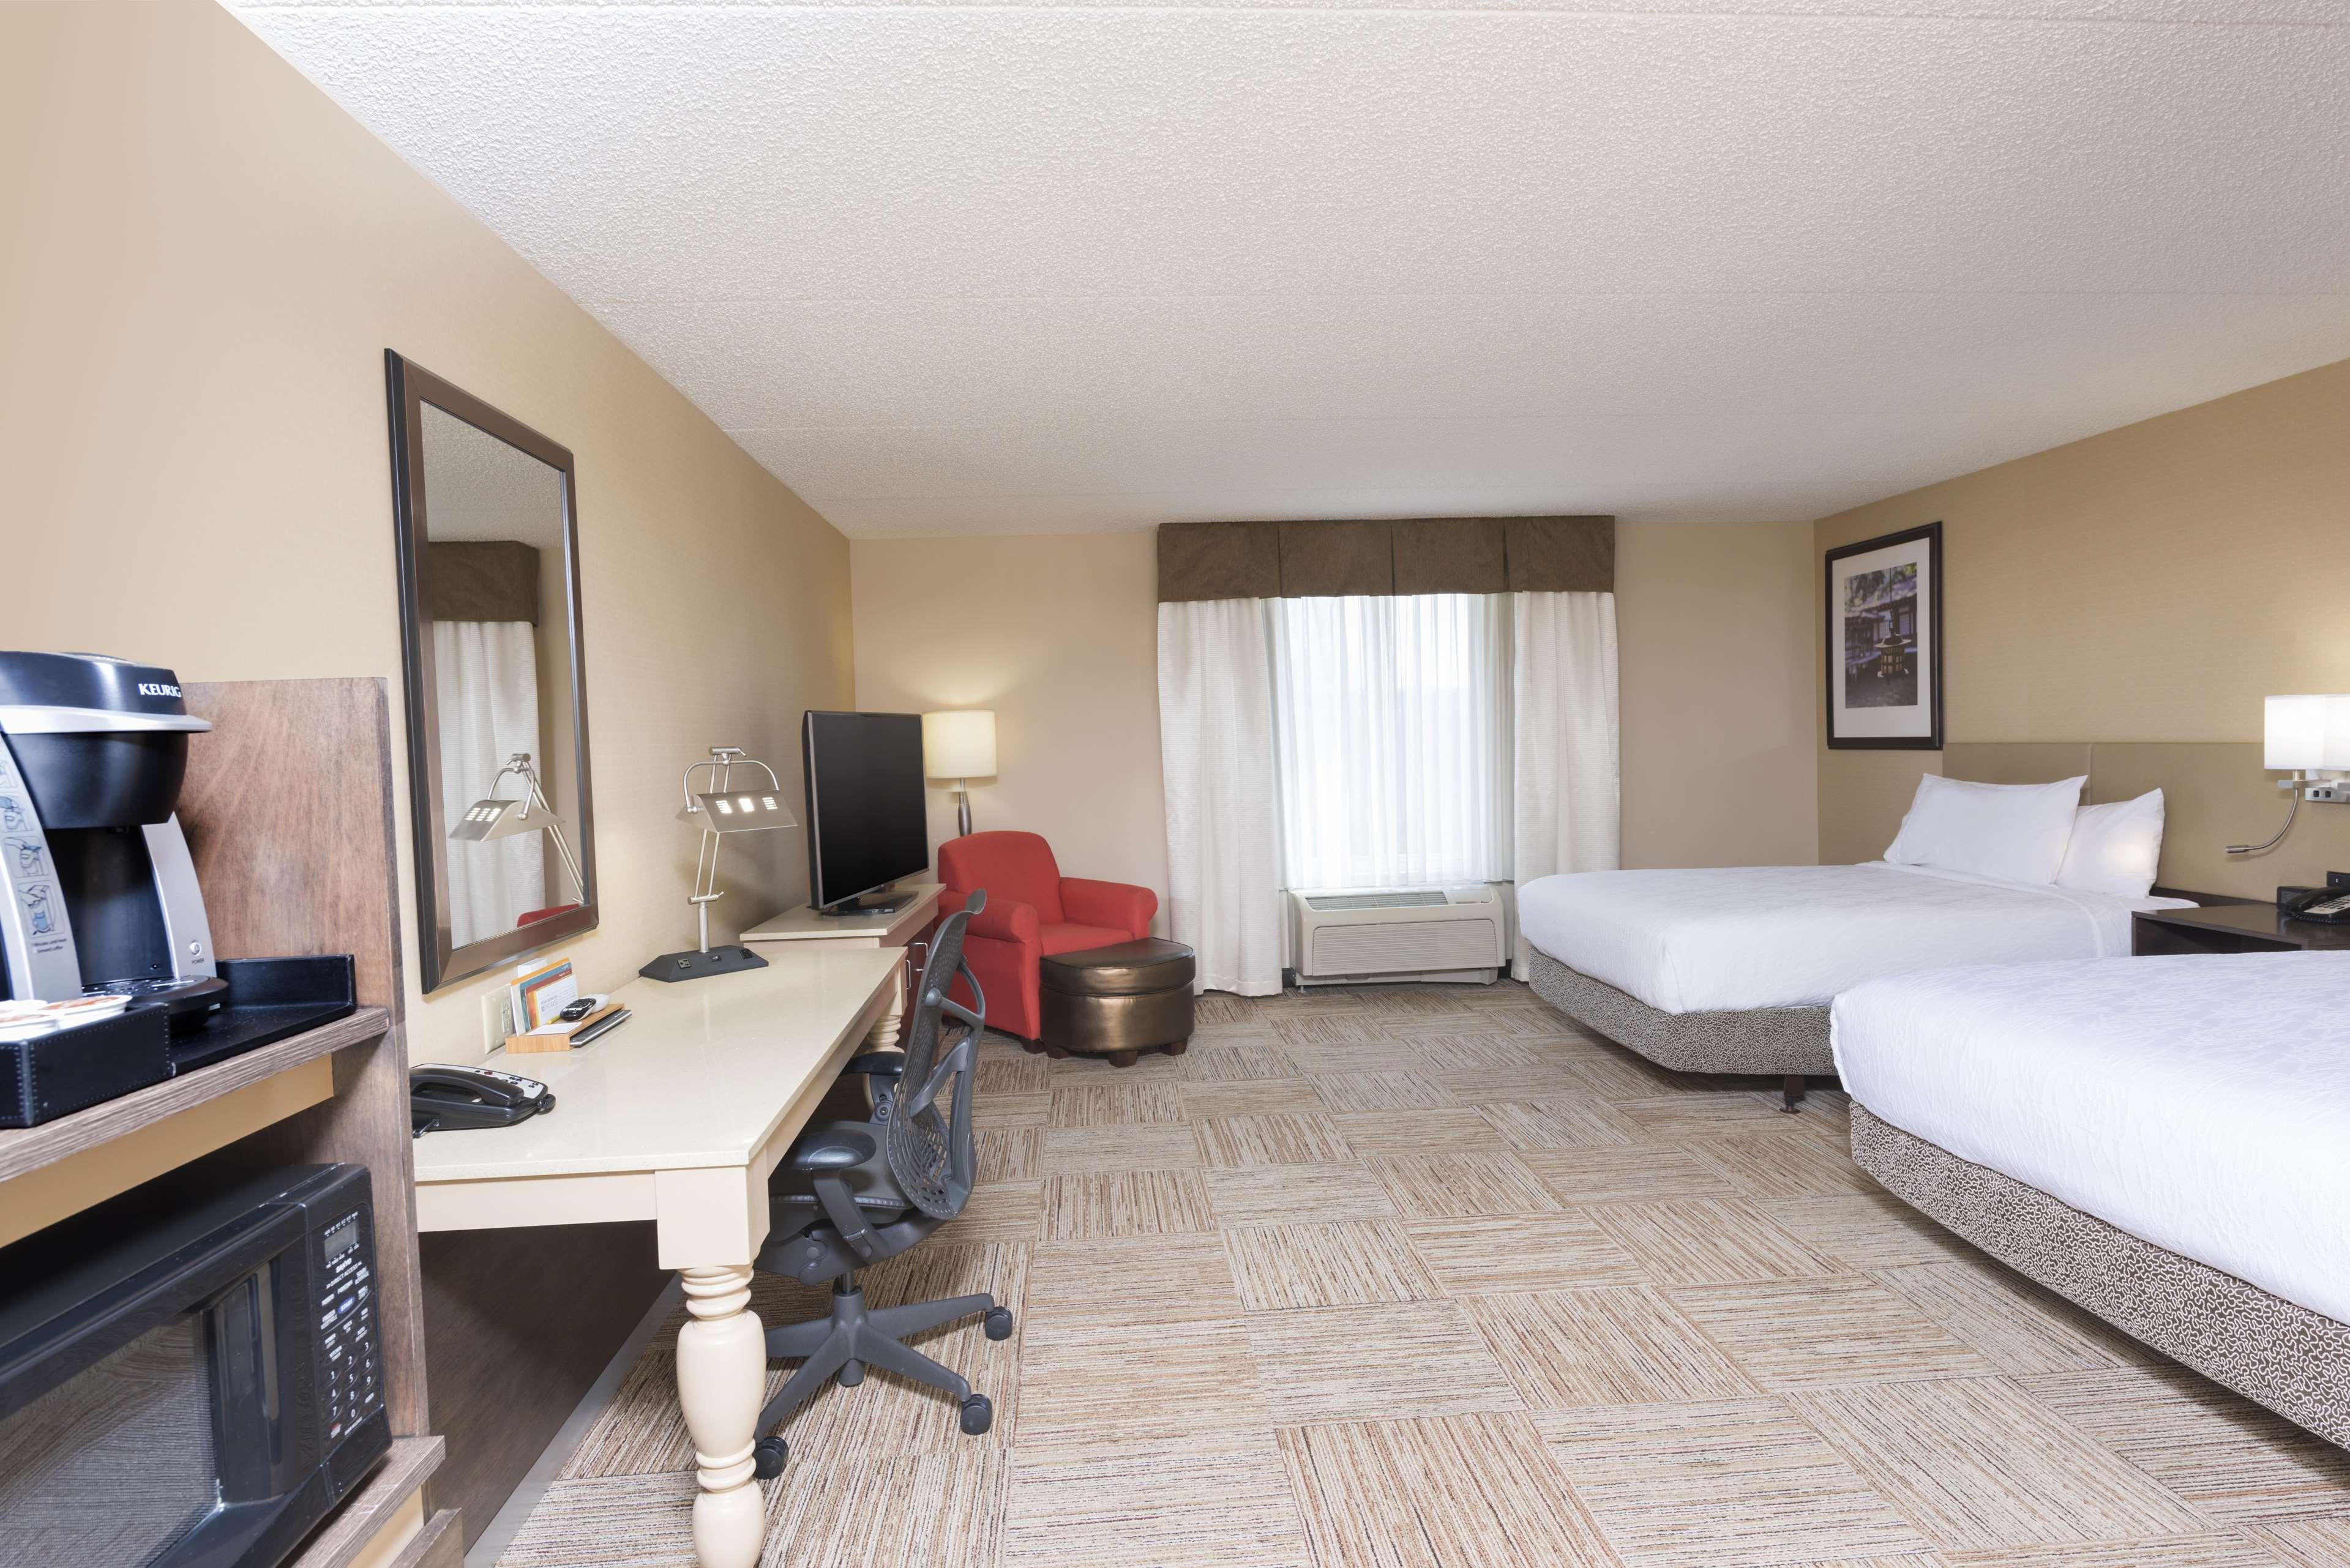 Hilton Garden Inn West Lafayette Wabash Landing image 34